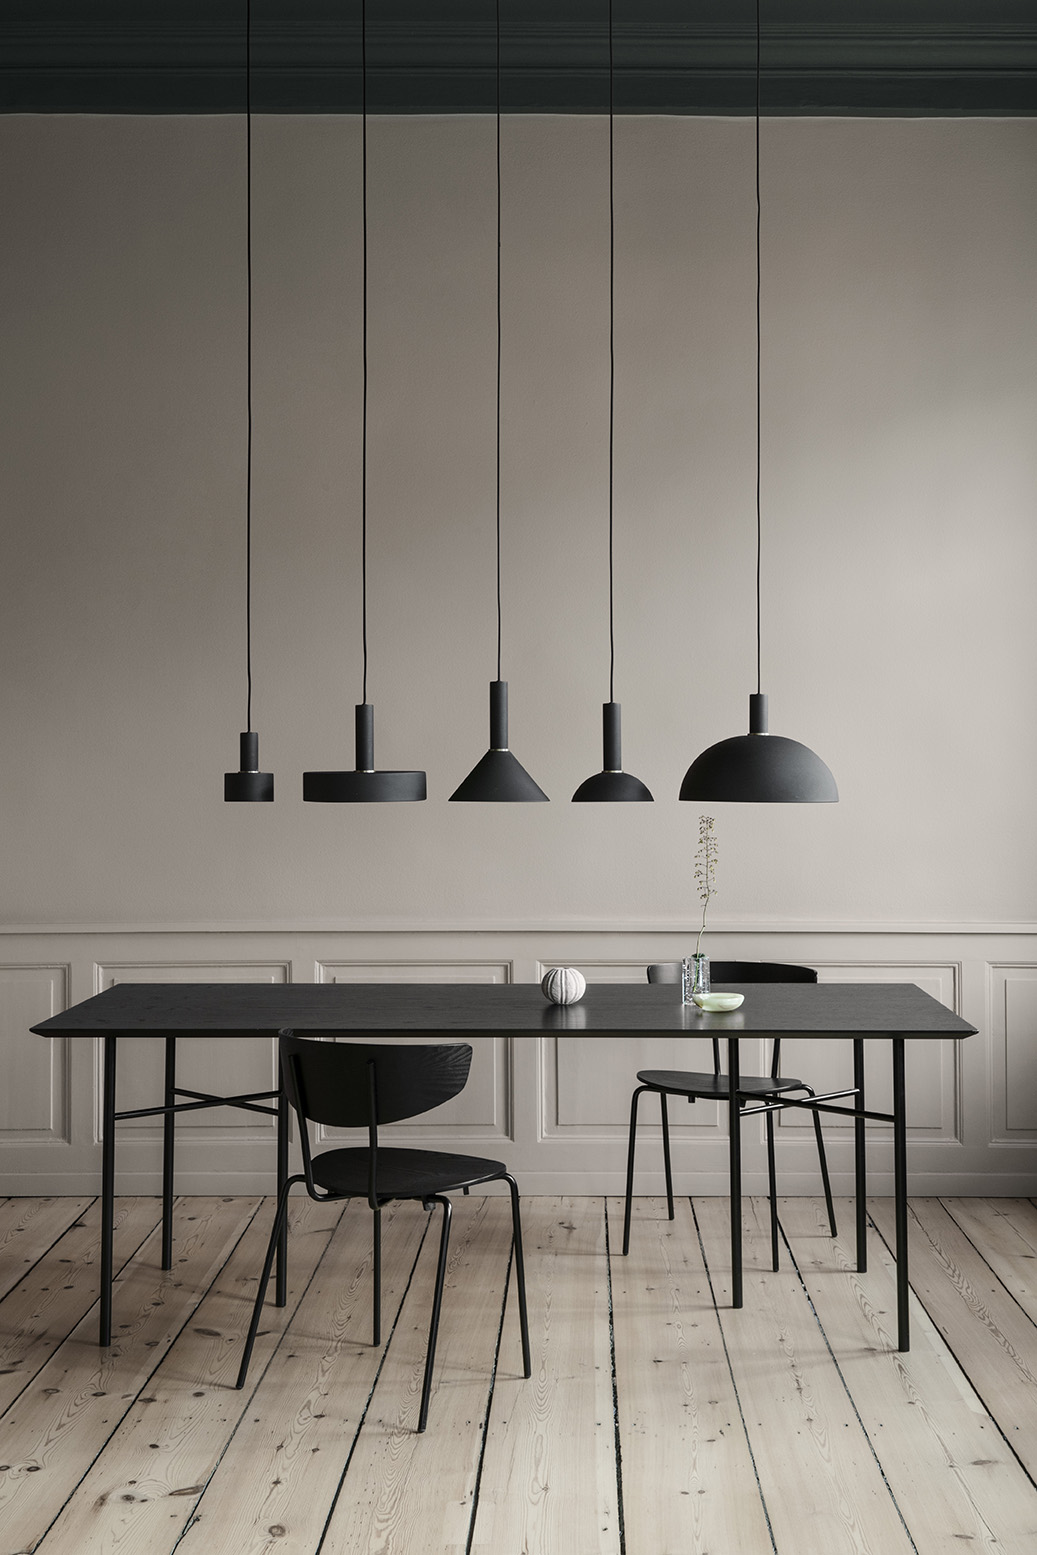 new ferm living collection coco lapine designcoco lapine design. Black Bedroom Furniture Sets. Home Design Ideas